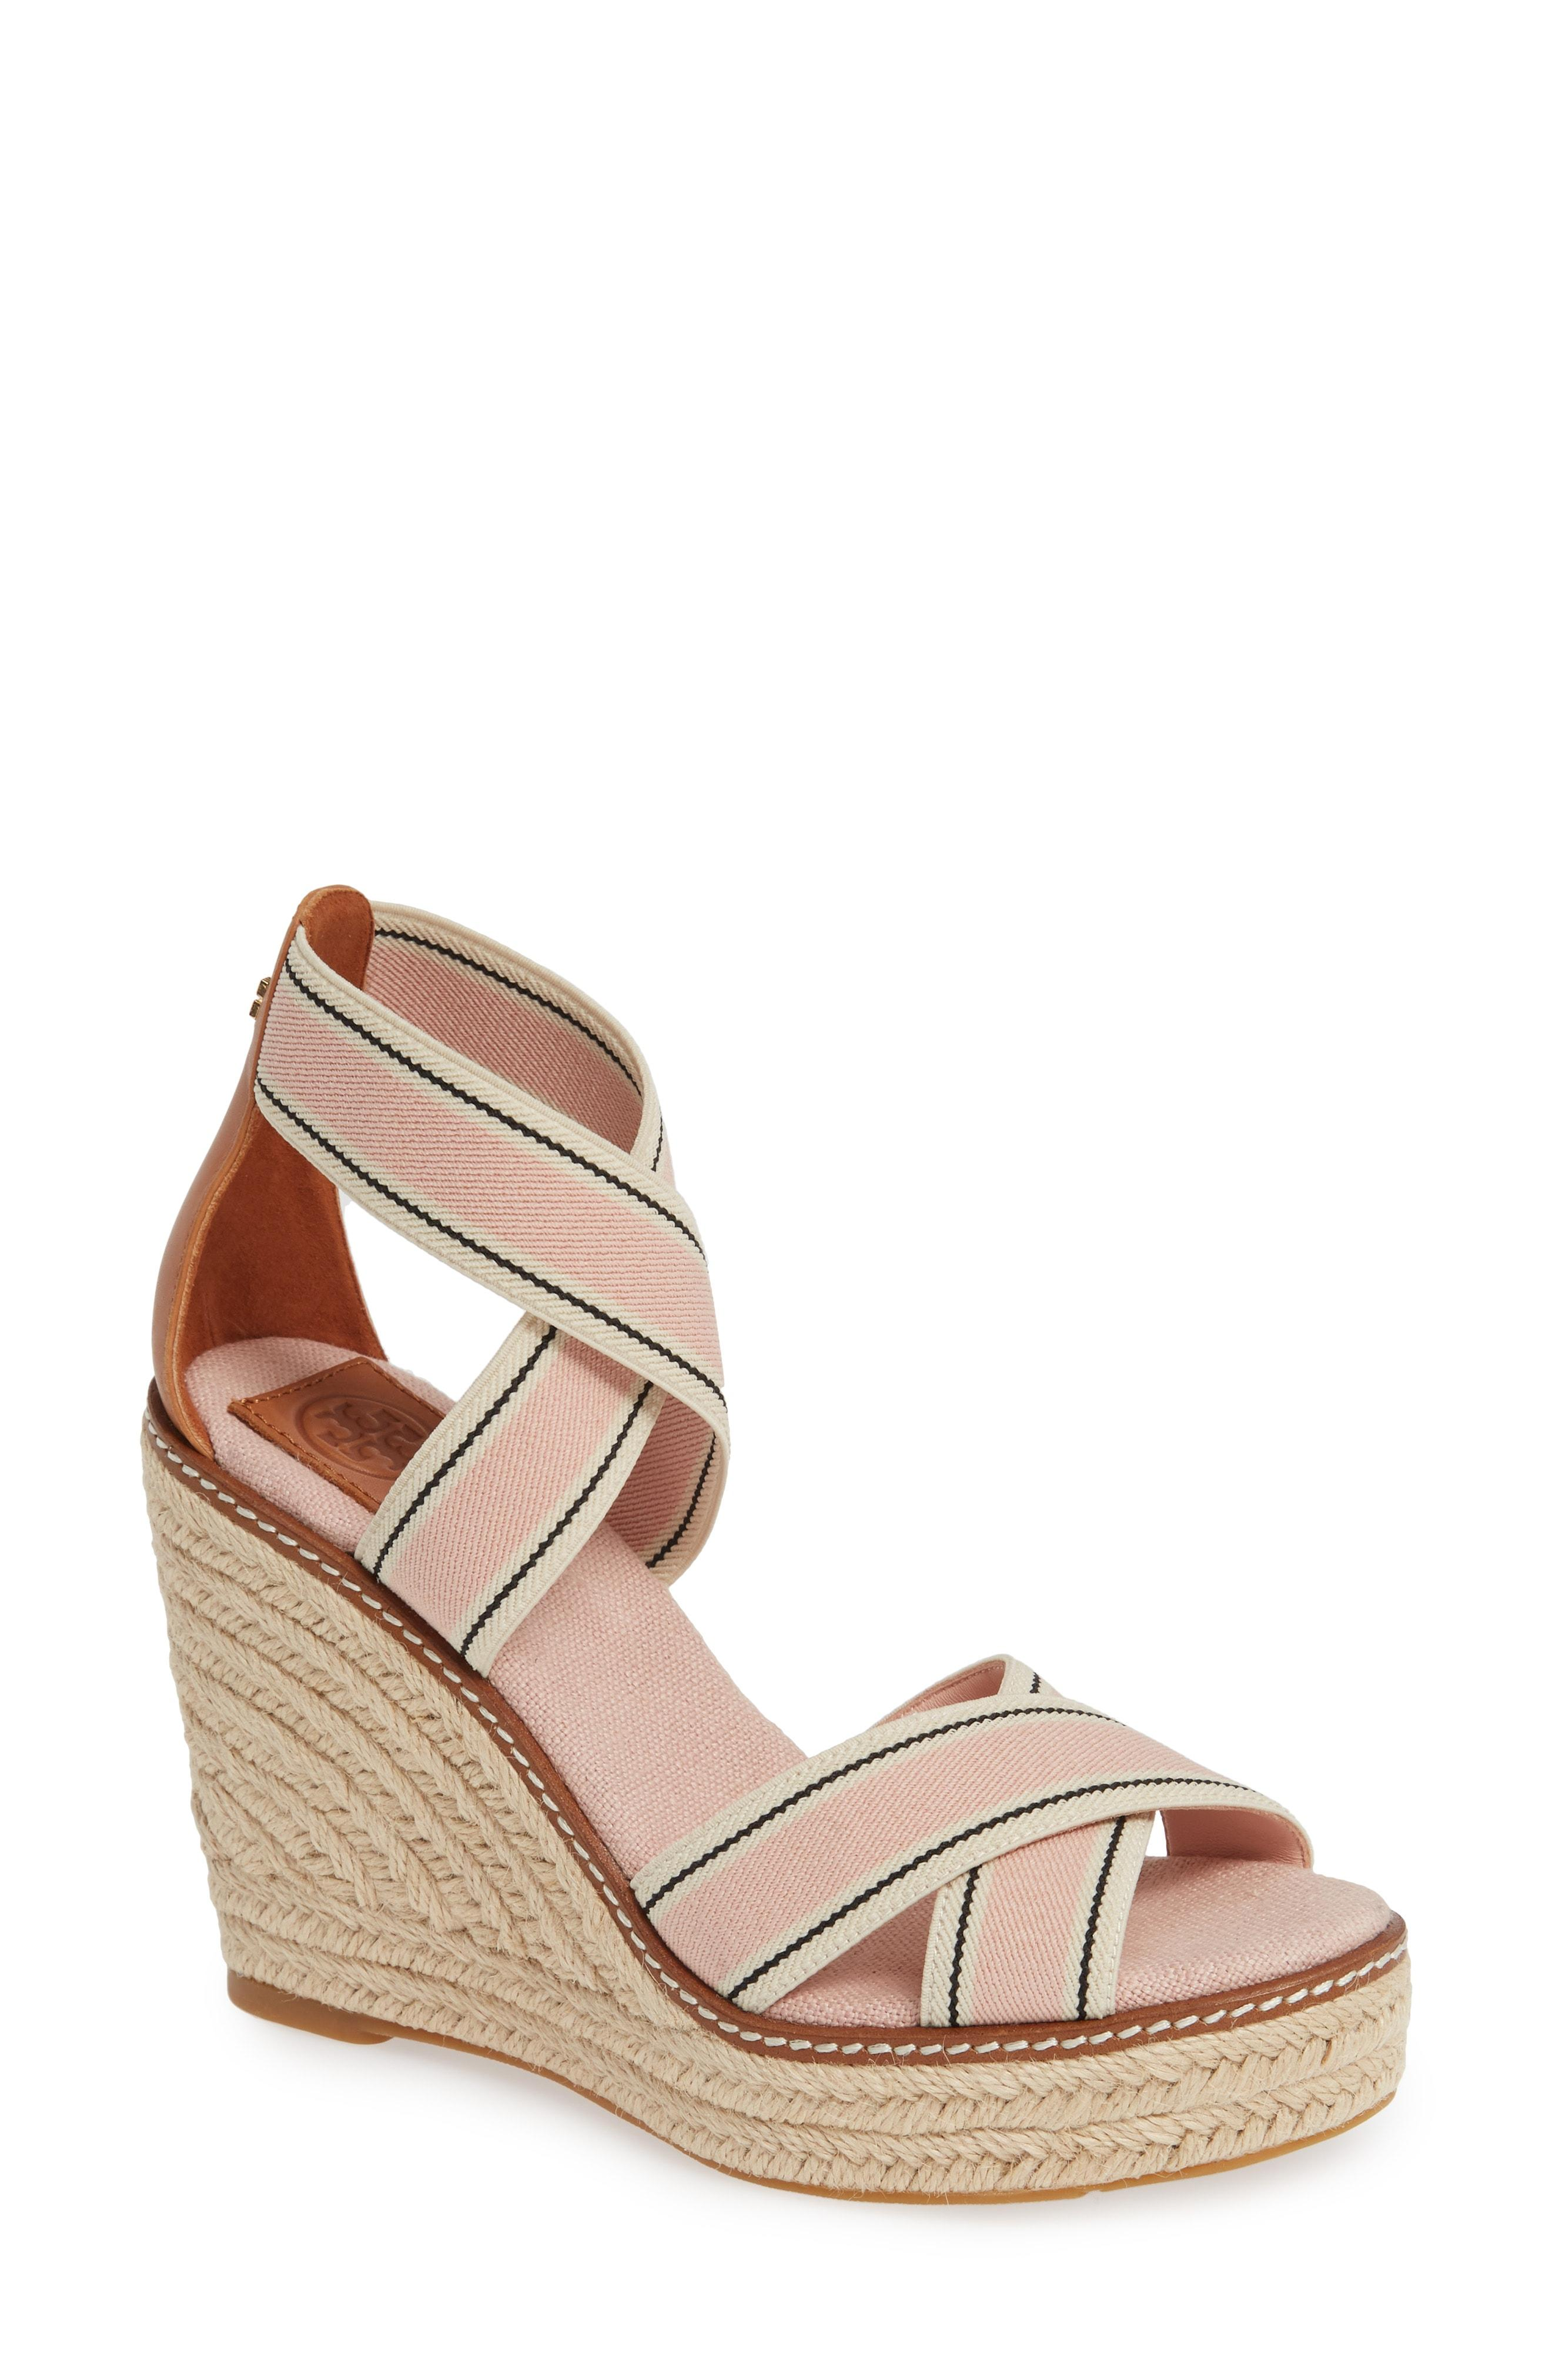 67f5629ec4651f Lyst - Tory Burch Frieda Espadrille Wedge Sandal in Brown